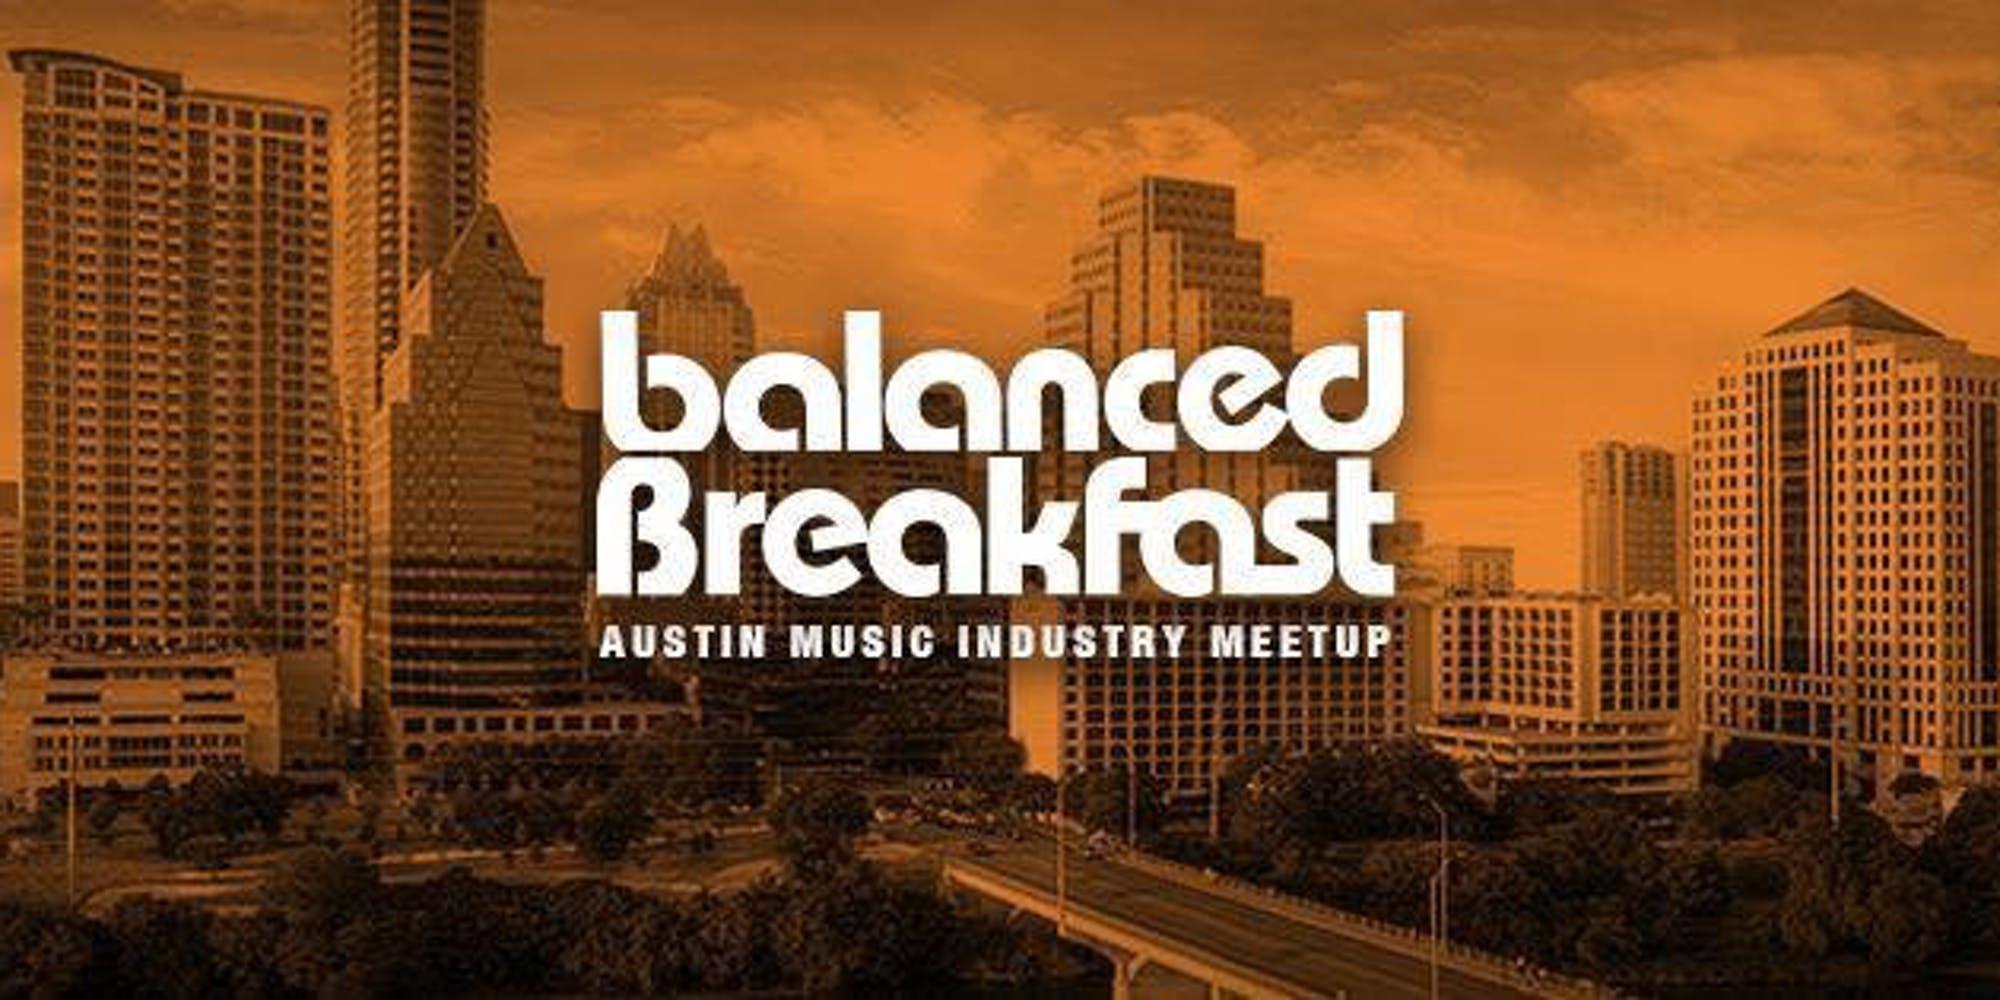 BB Austin Music Industry Meetup at Genuine Joe Coffee